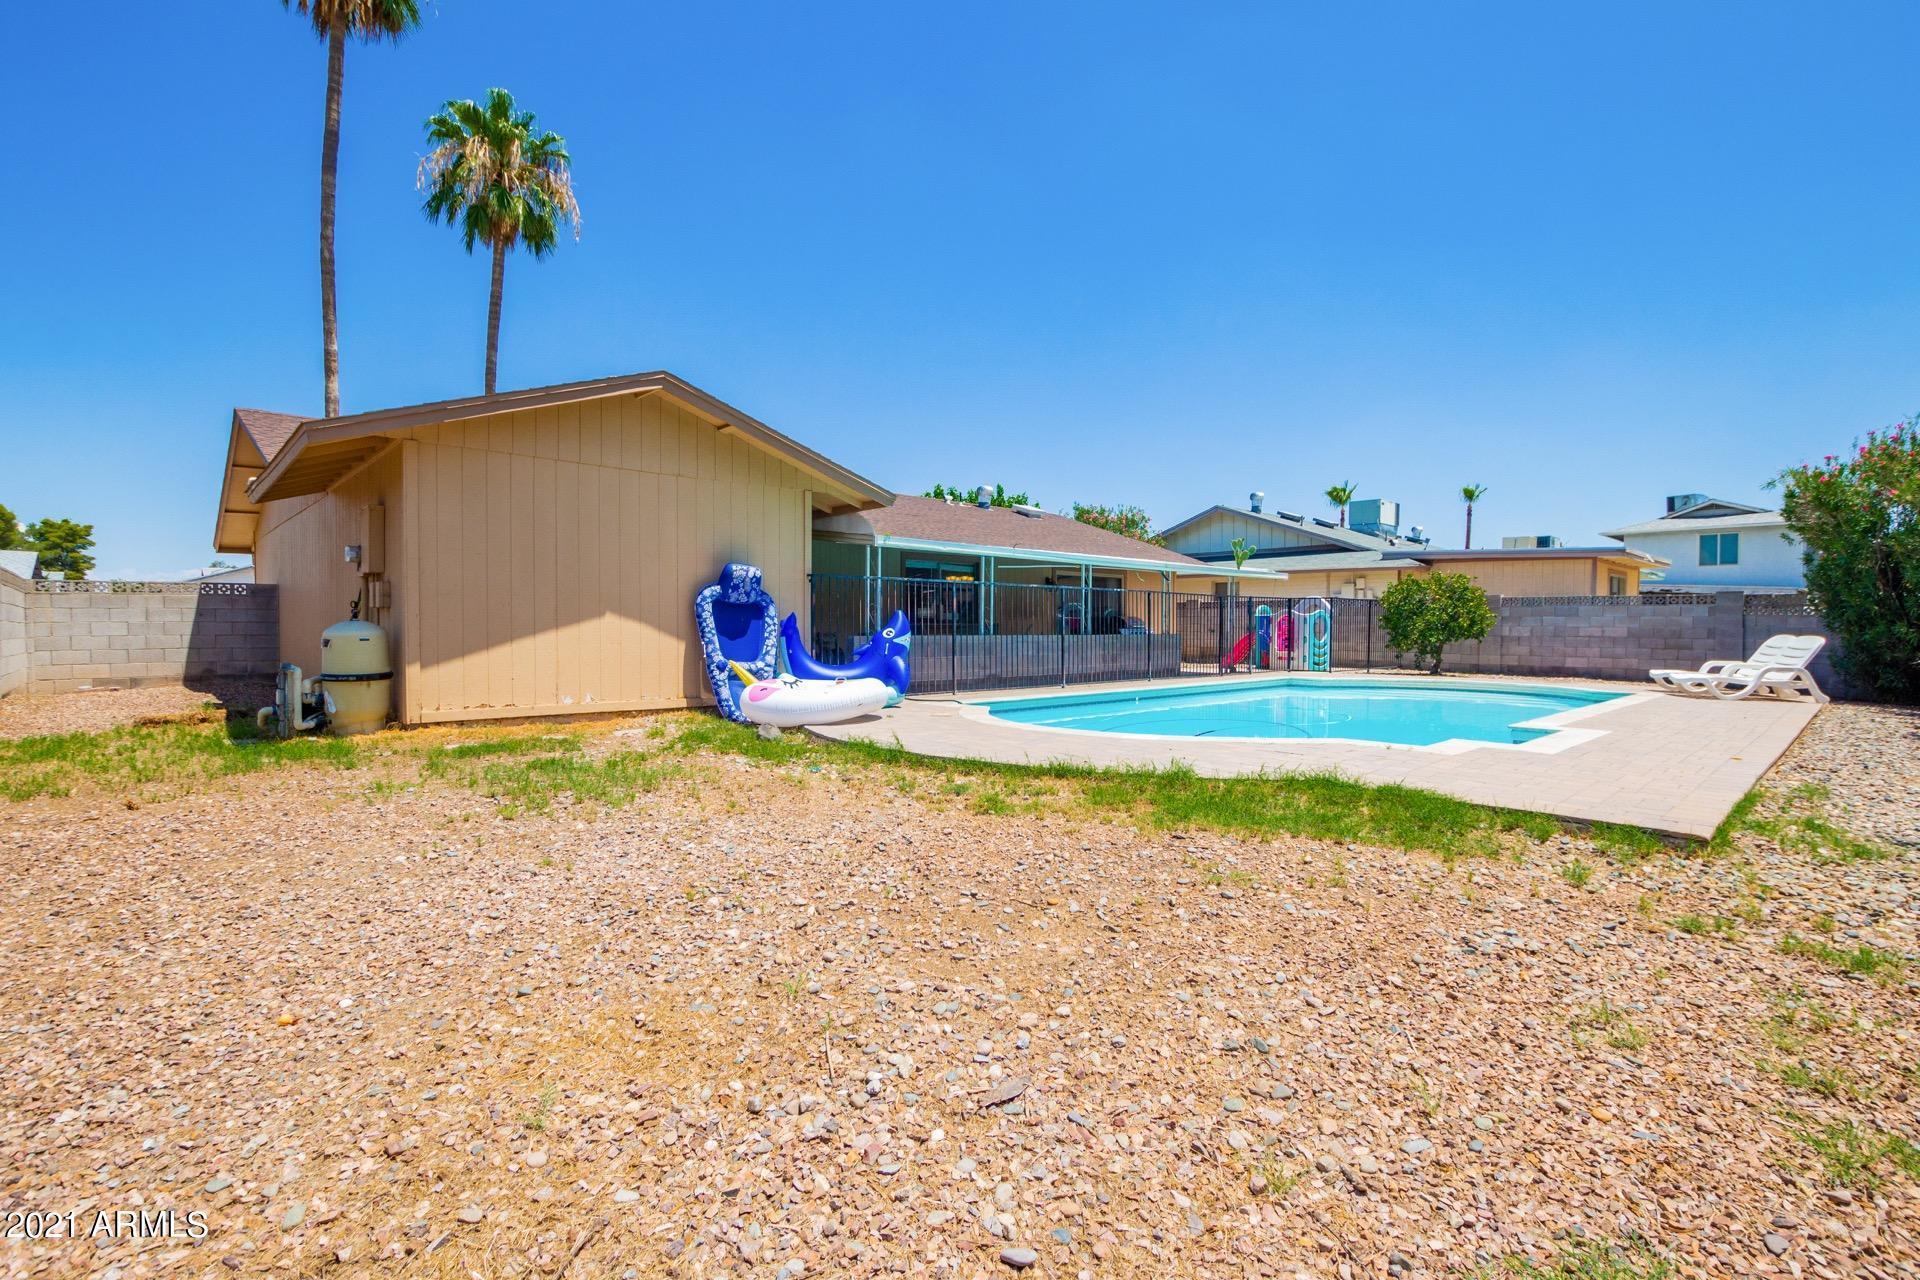 MLS 6269849 5719 W ZOE ELLA Way, Glendale, AZ 85306 Glendale AZ Deerview